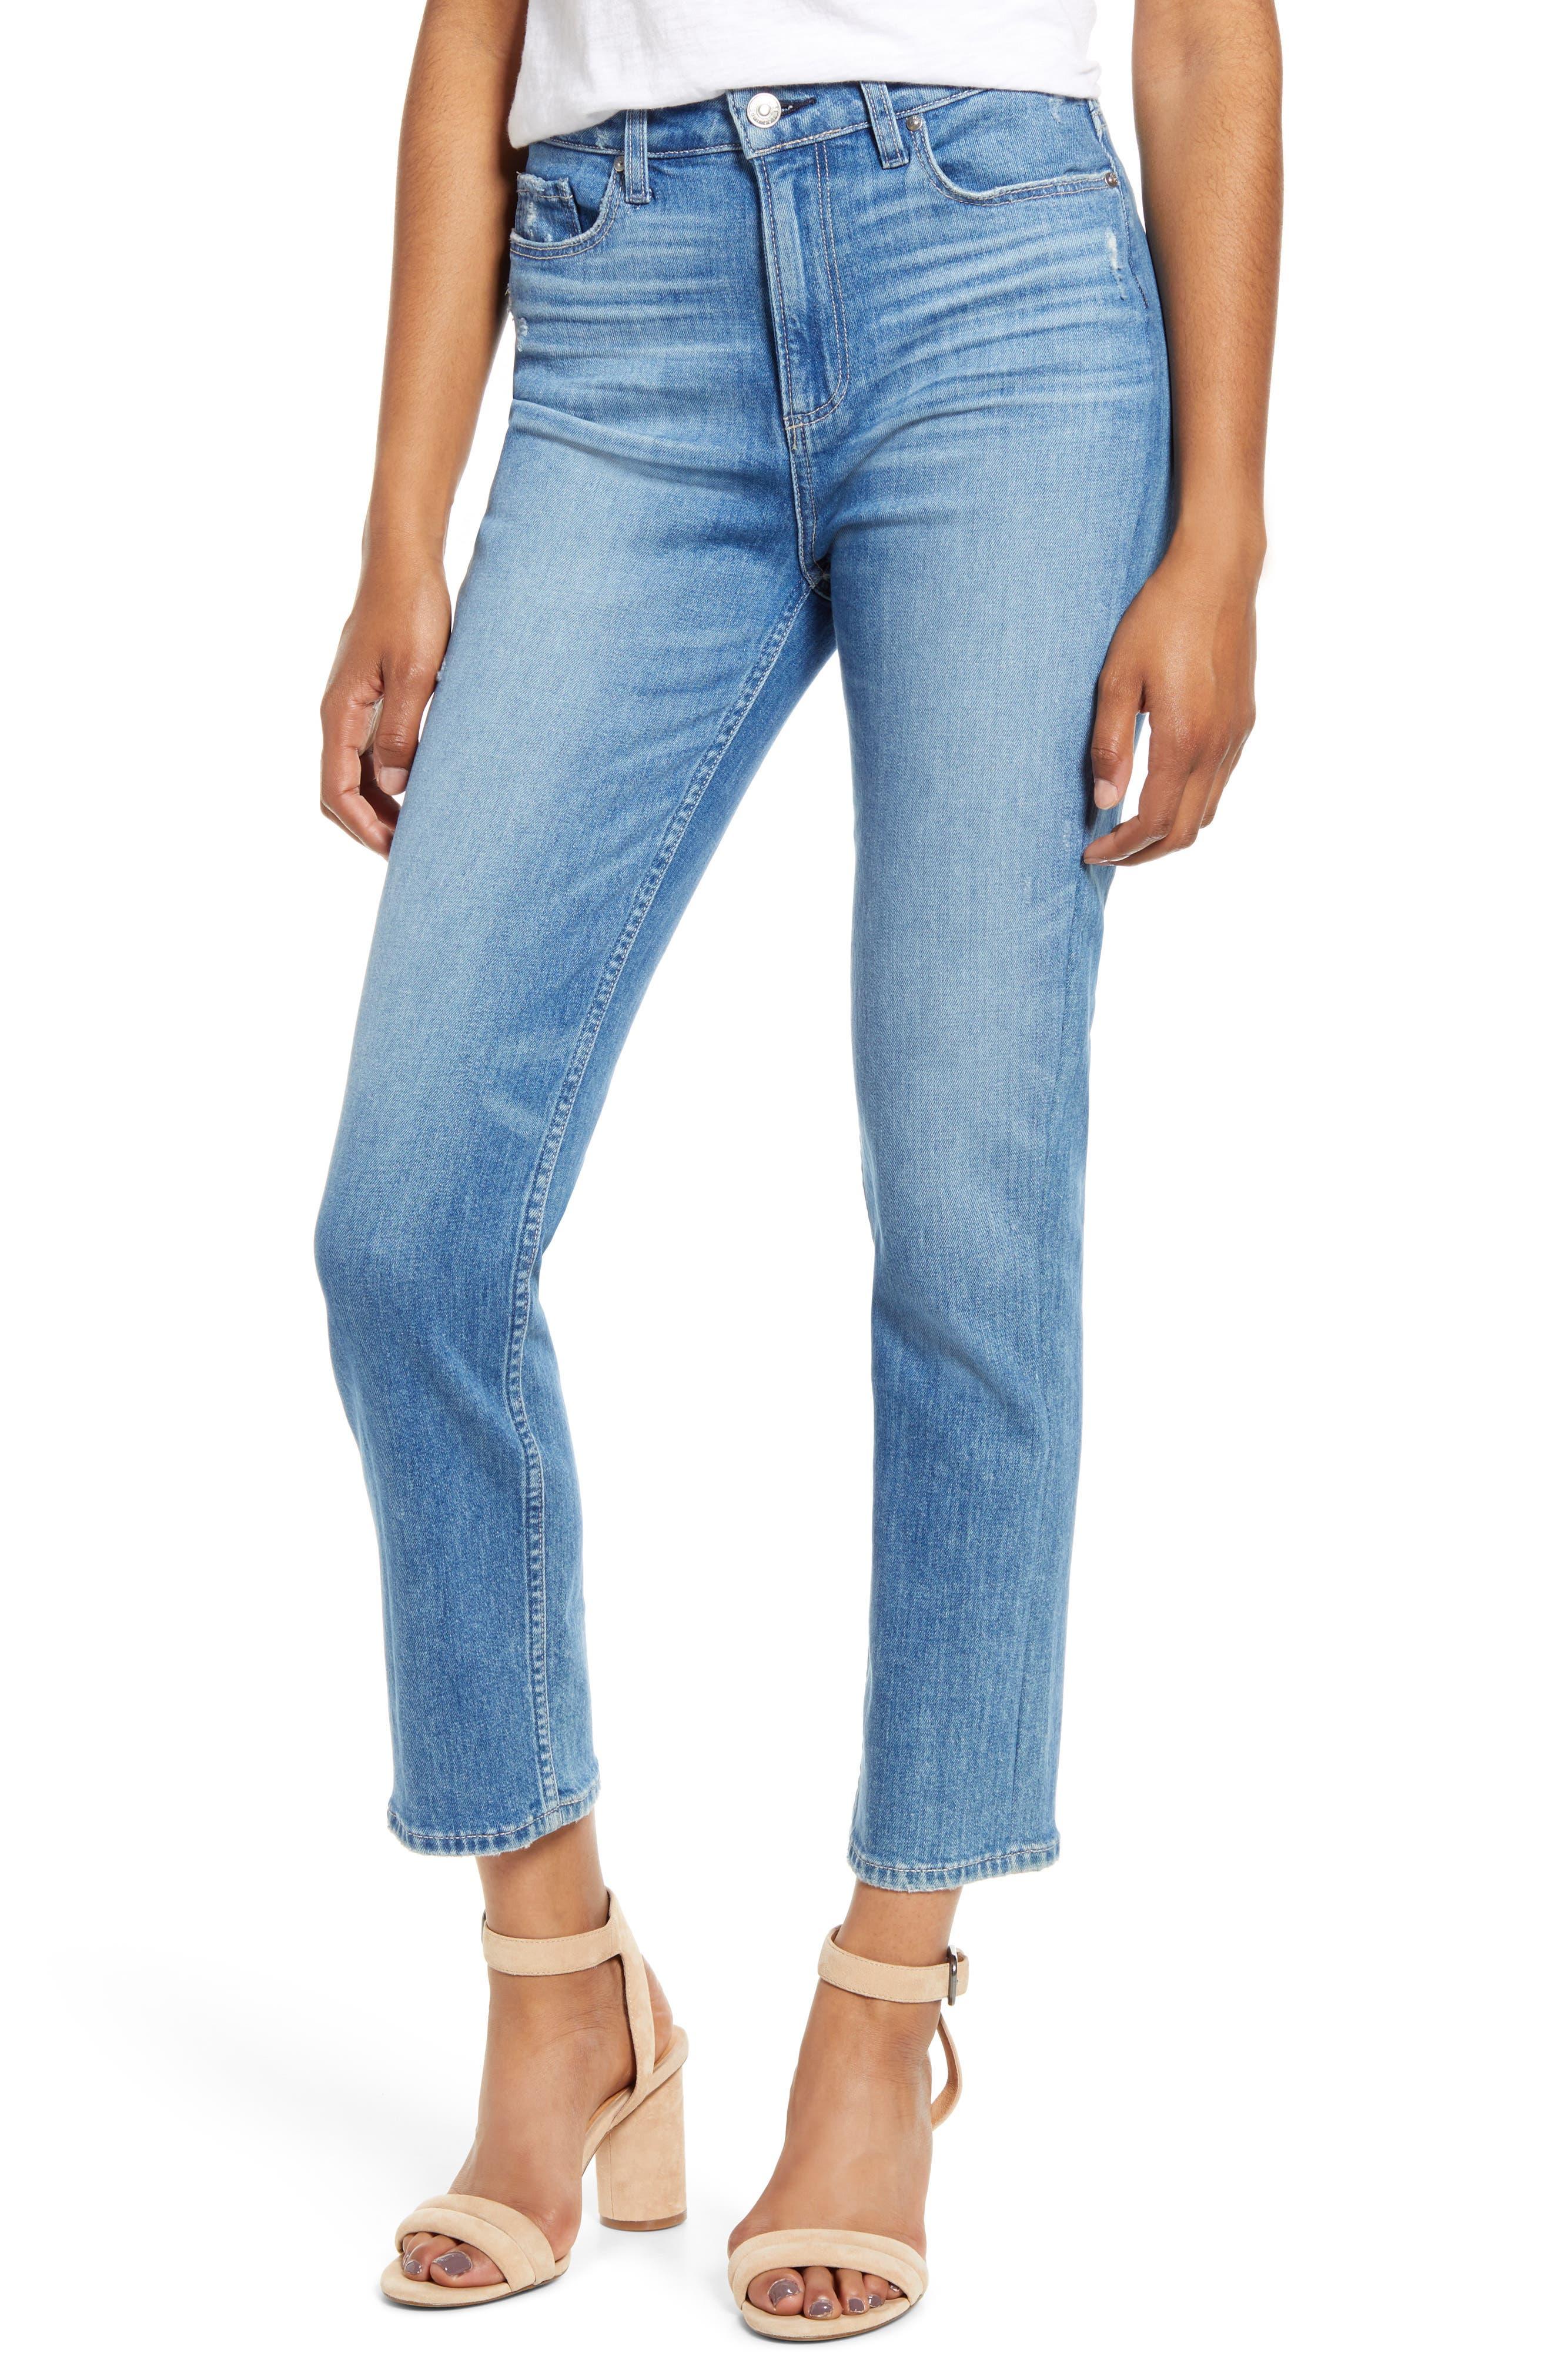 PAIGE Vintage - Hoxton High Waist Ankle Slim Fit Jeans (Casanova Distressed)